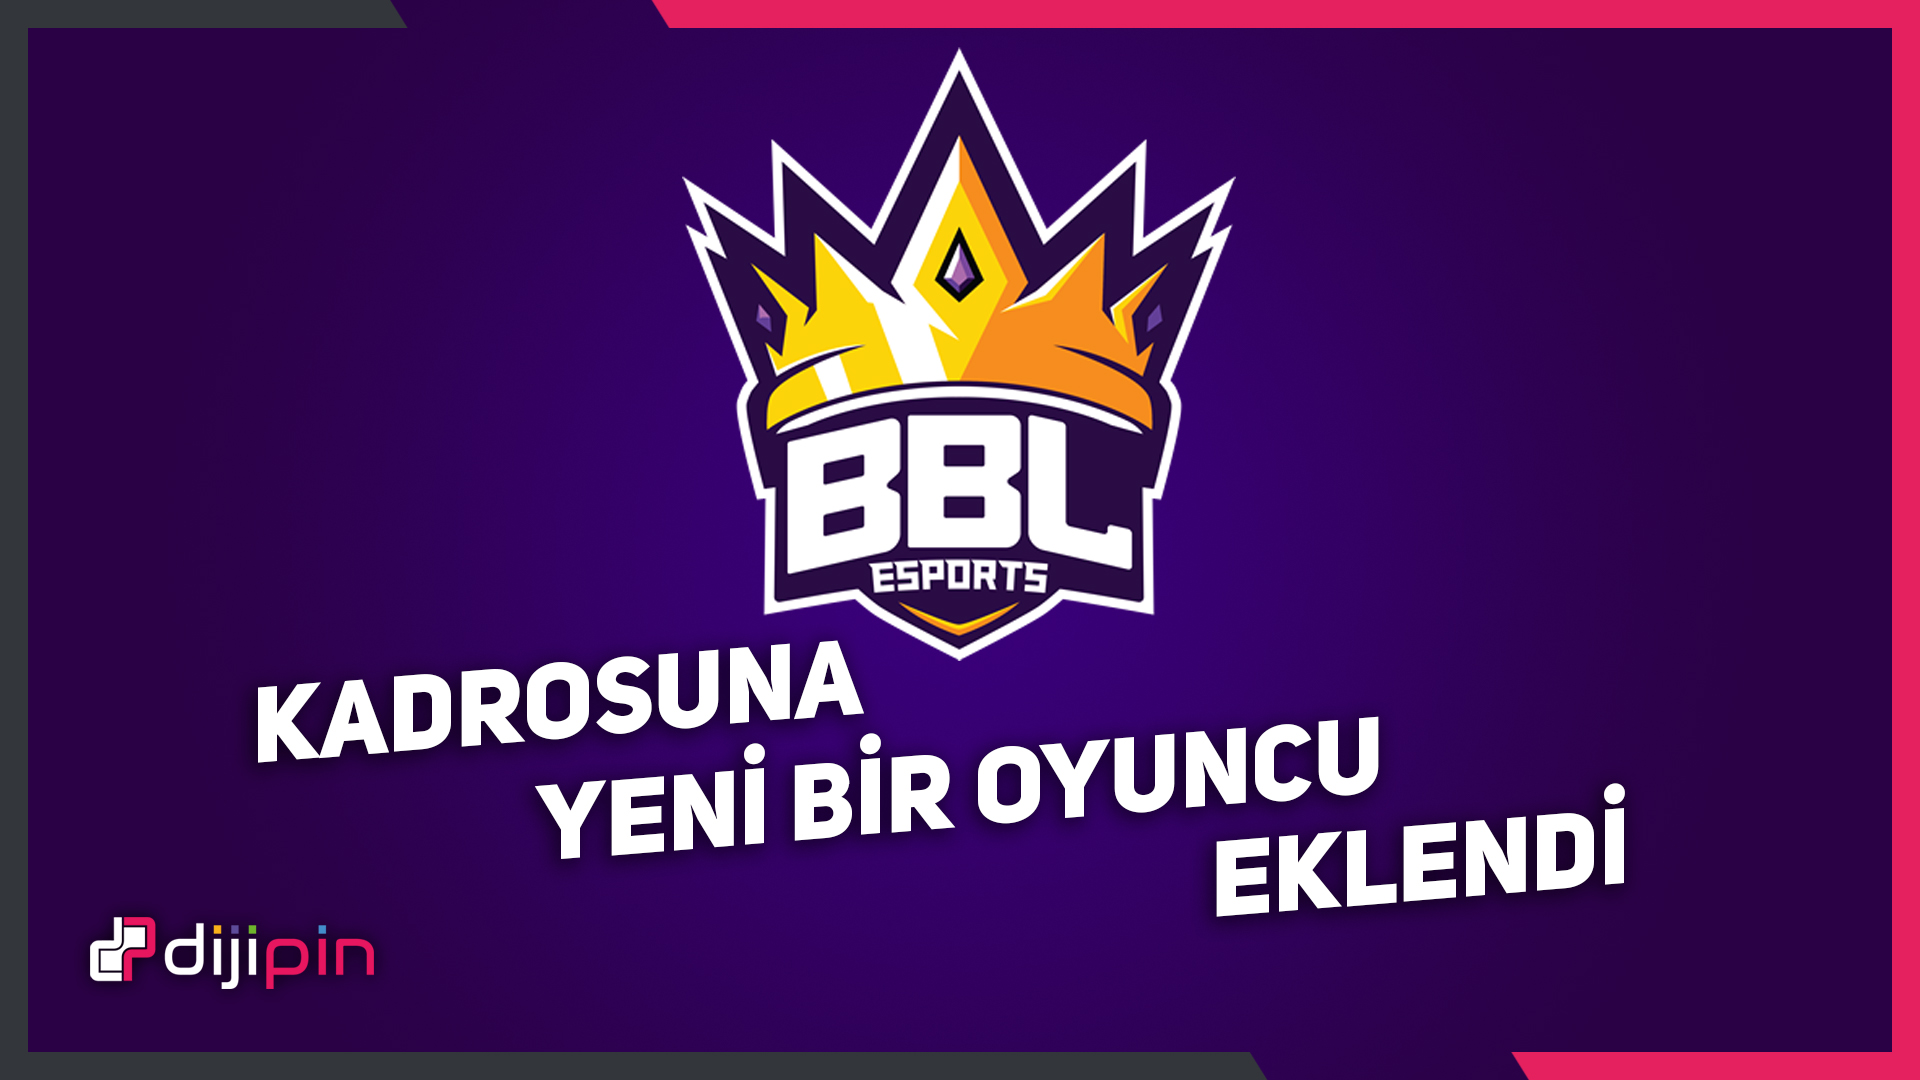 BBL Esports'un YENİ OYUNCUSU!